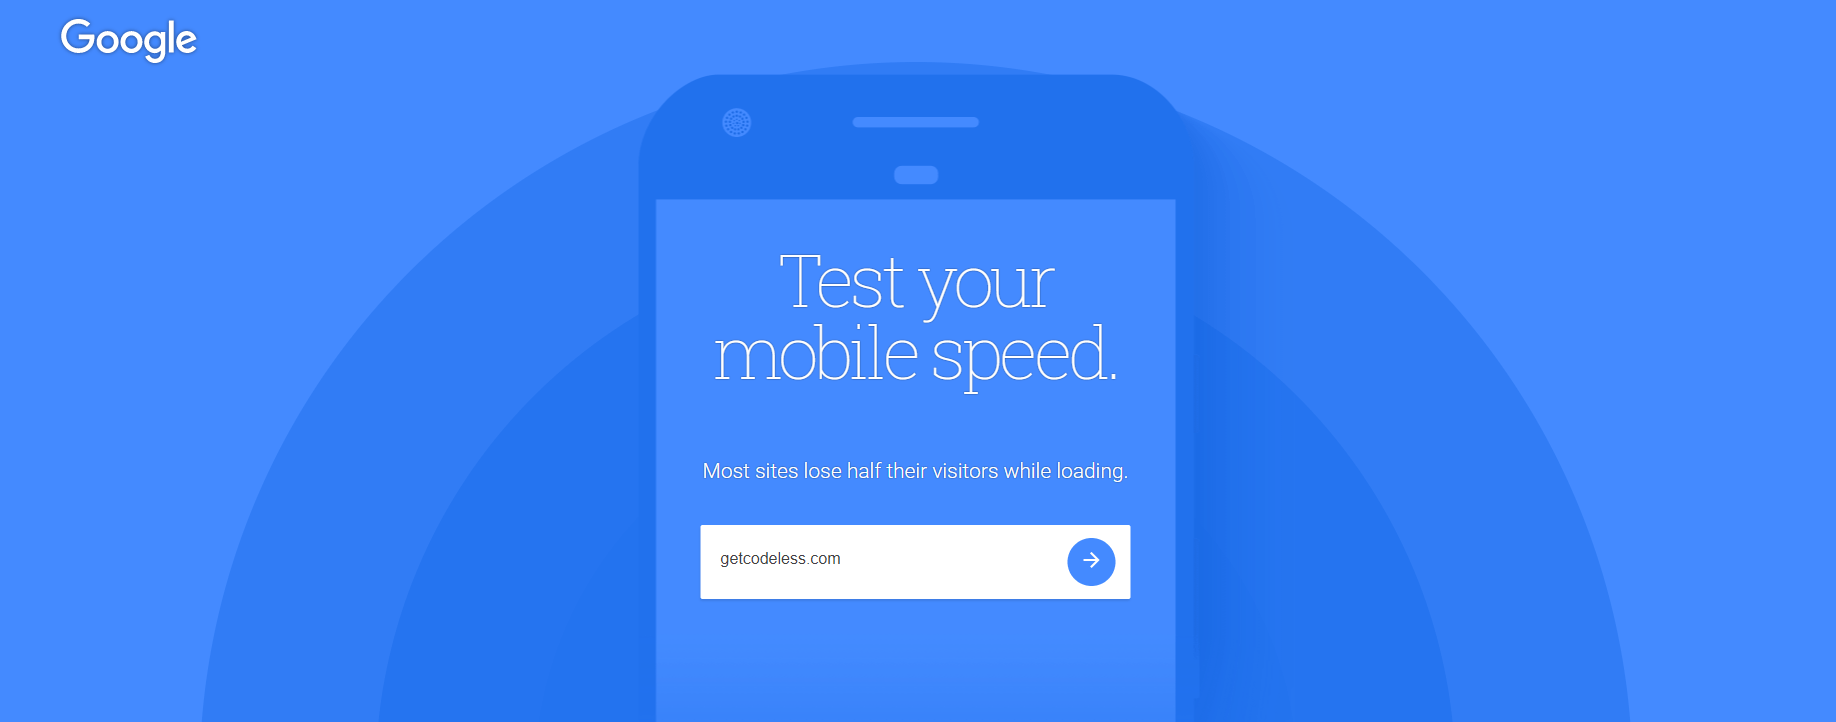 Google Test My Site tool